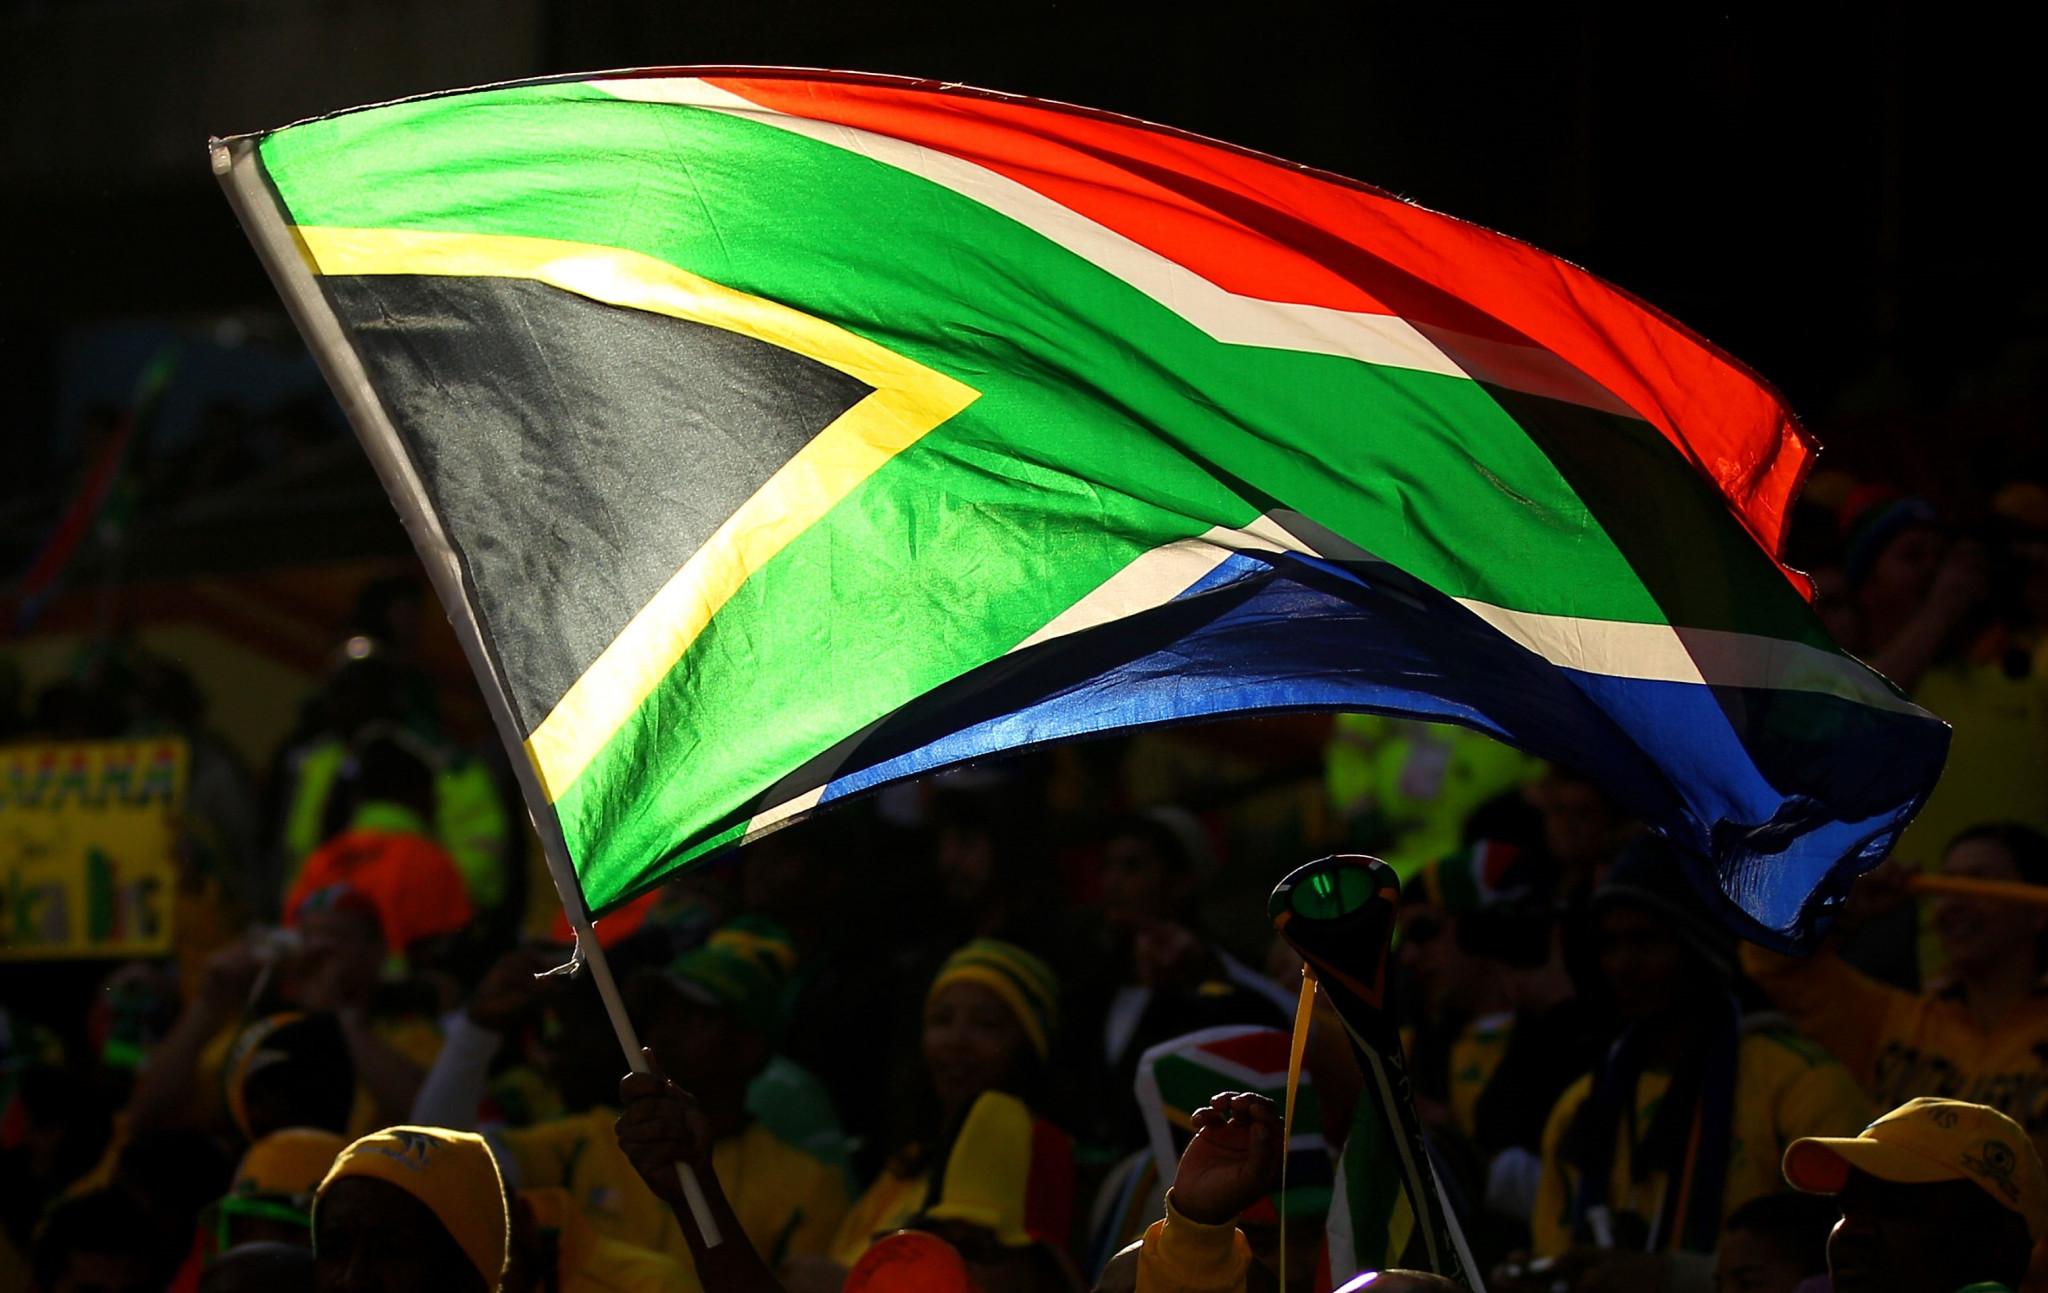 South African Lacrosse Association granted World Lacrosse membership